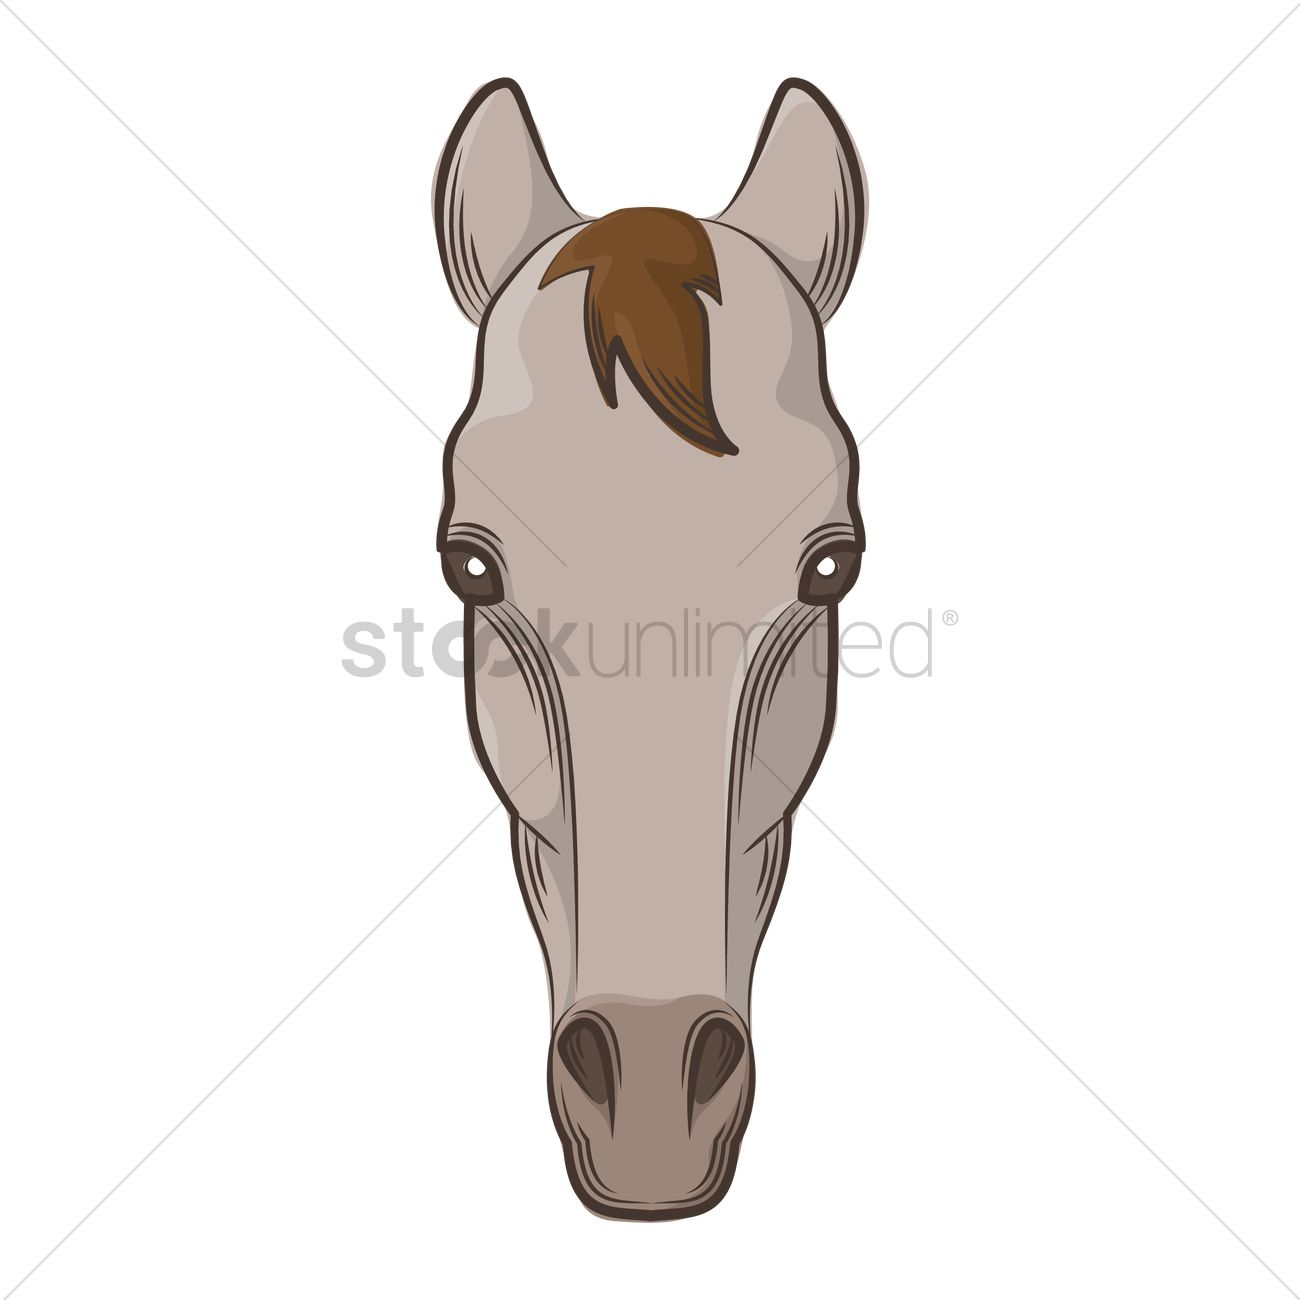 1300x1300 Horse Face Vector Image